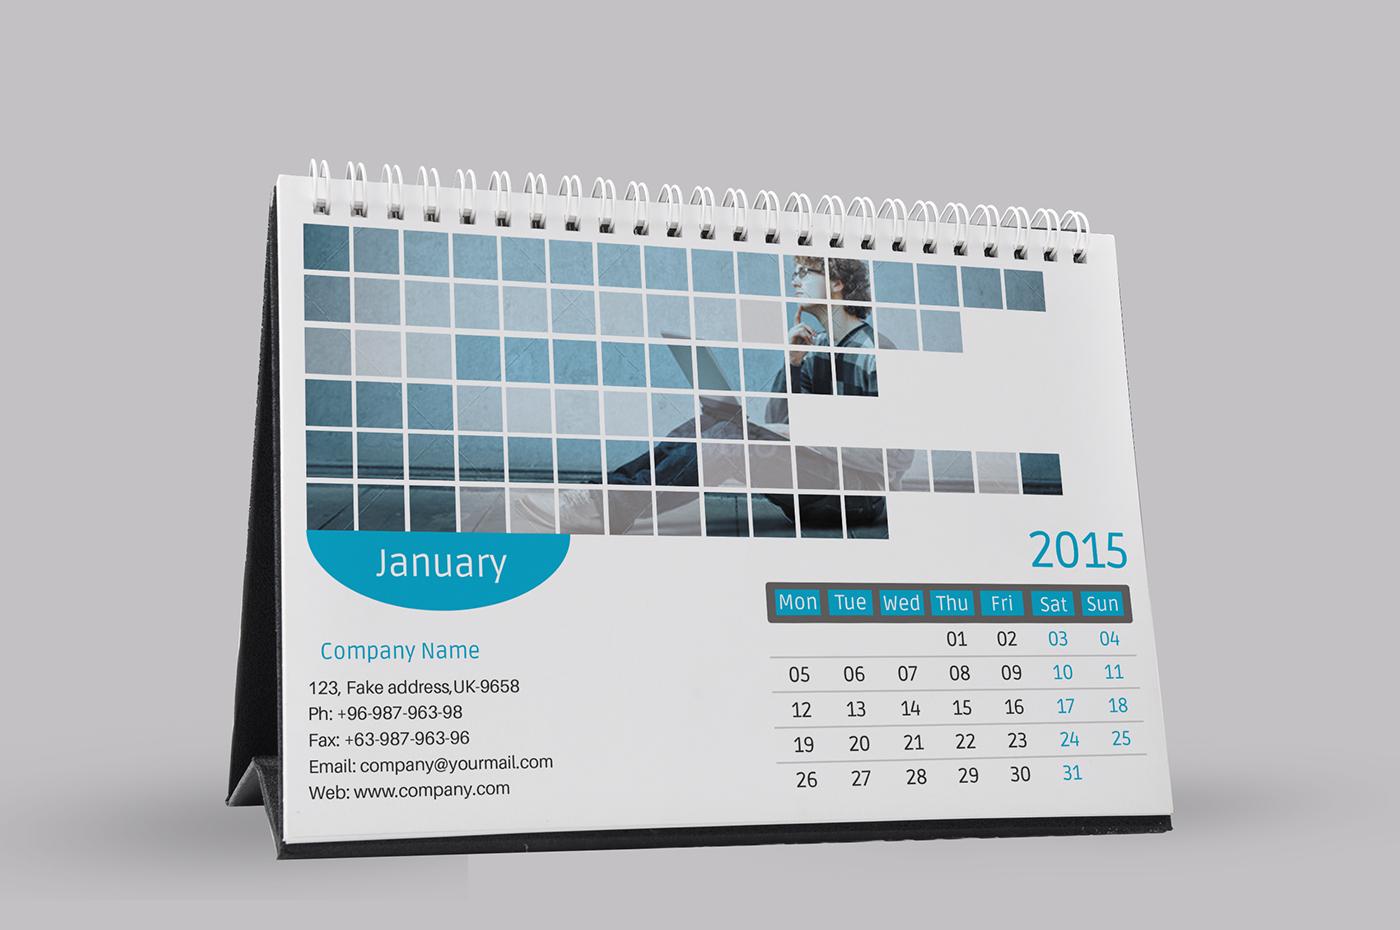 Calendar Design Template Psd : Corporate desk calendar template psd on behance